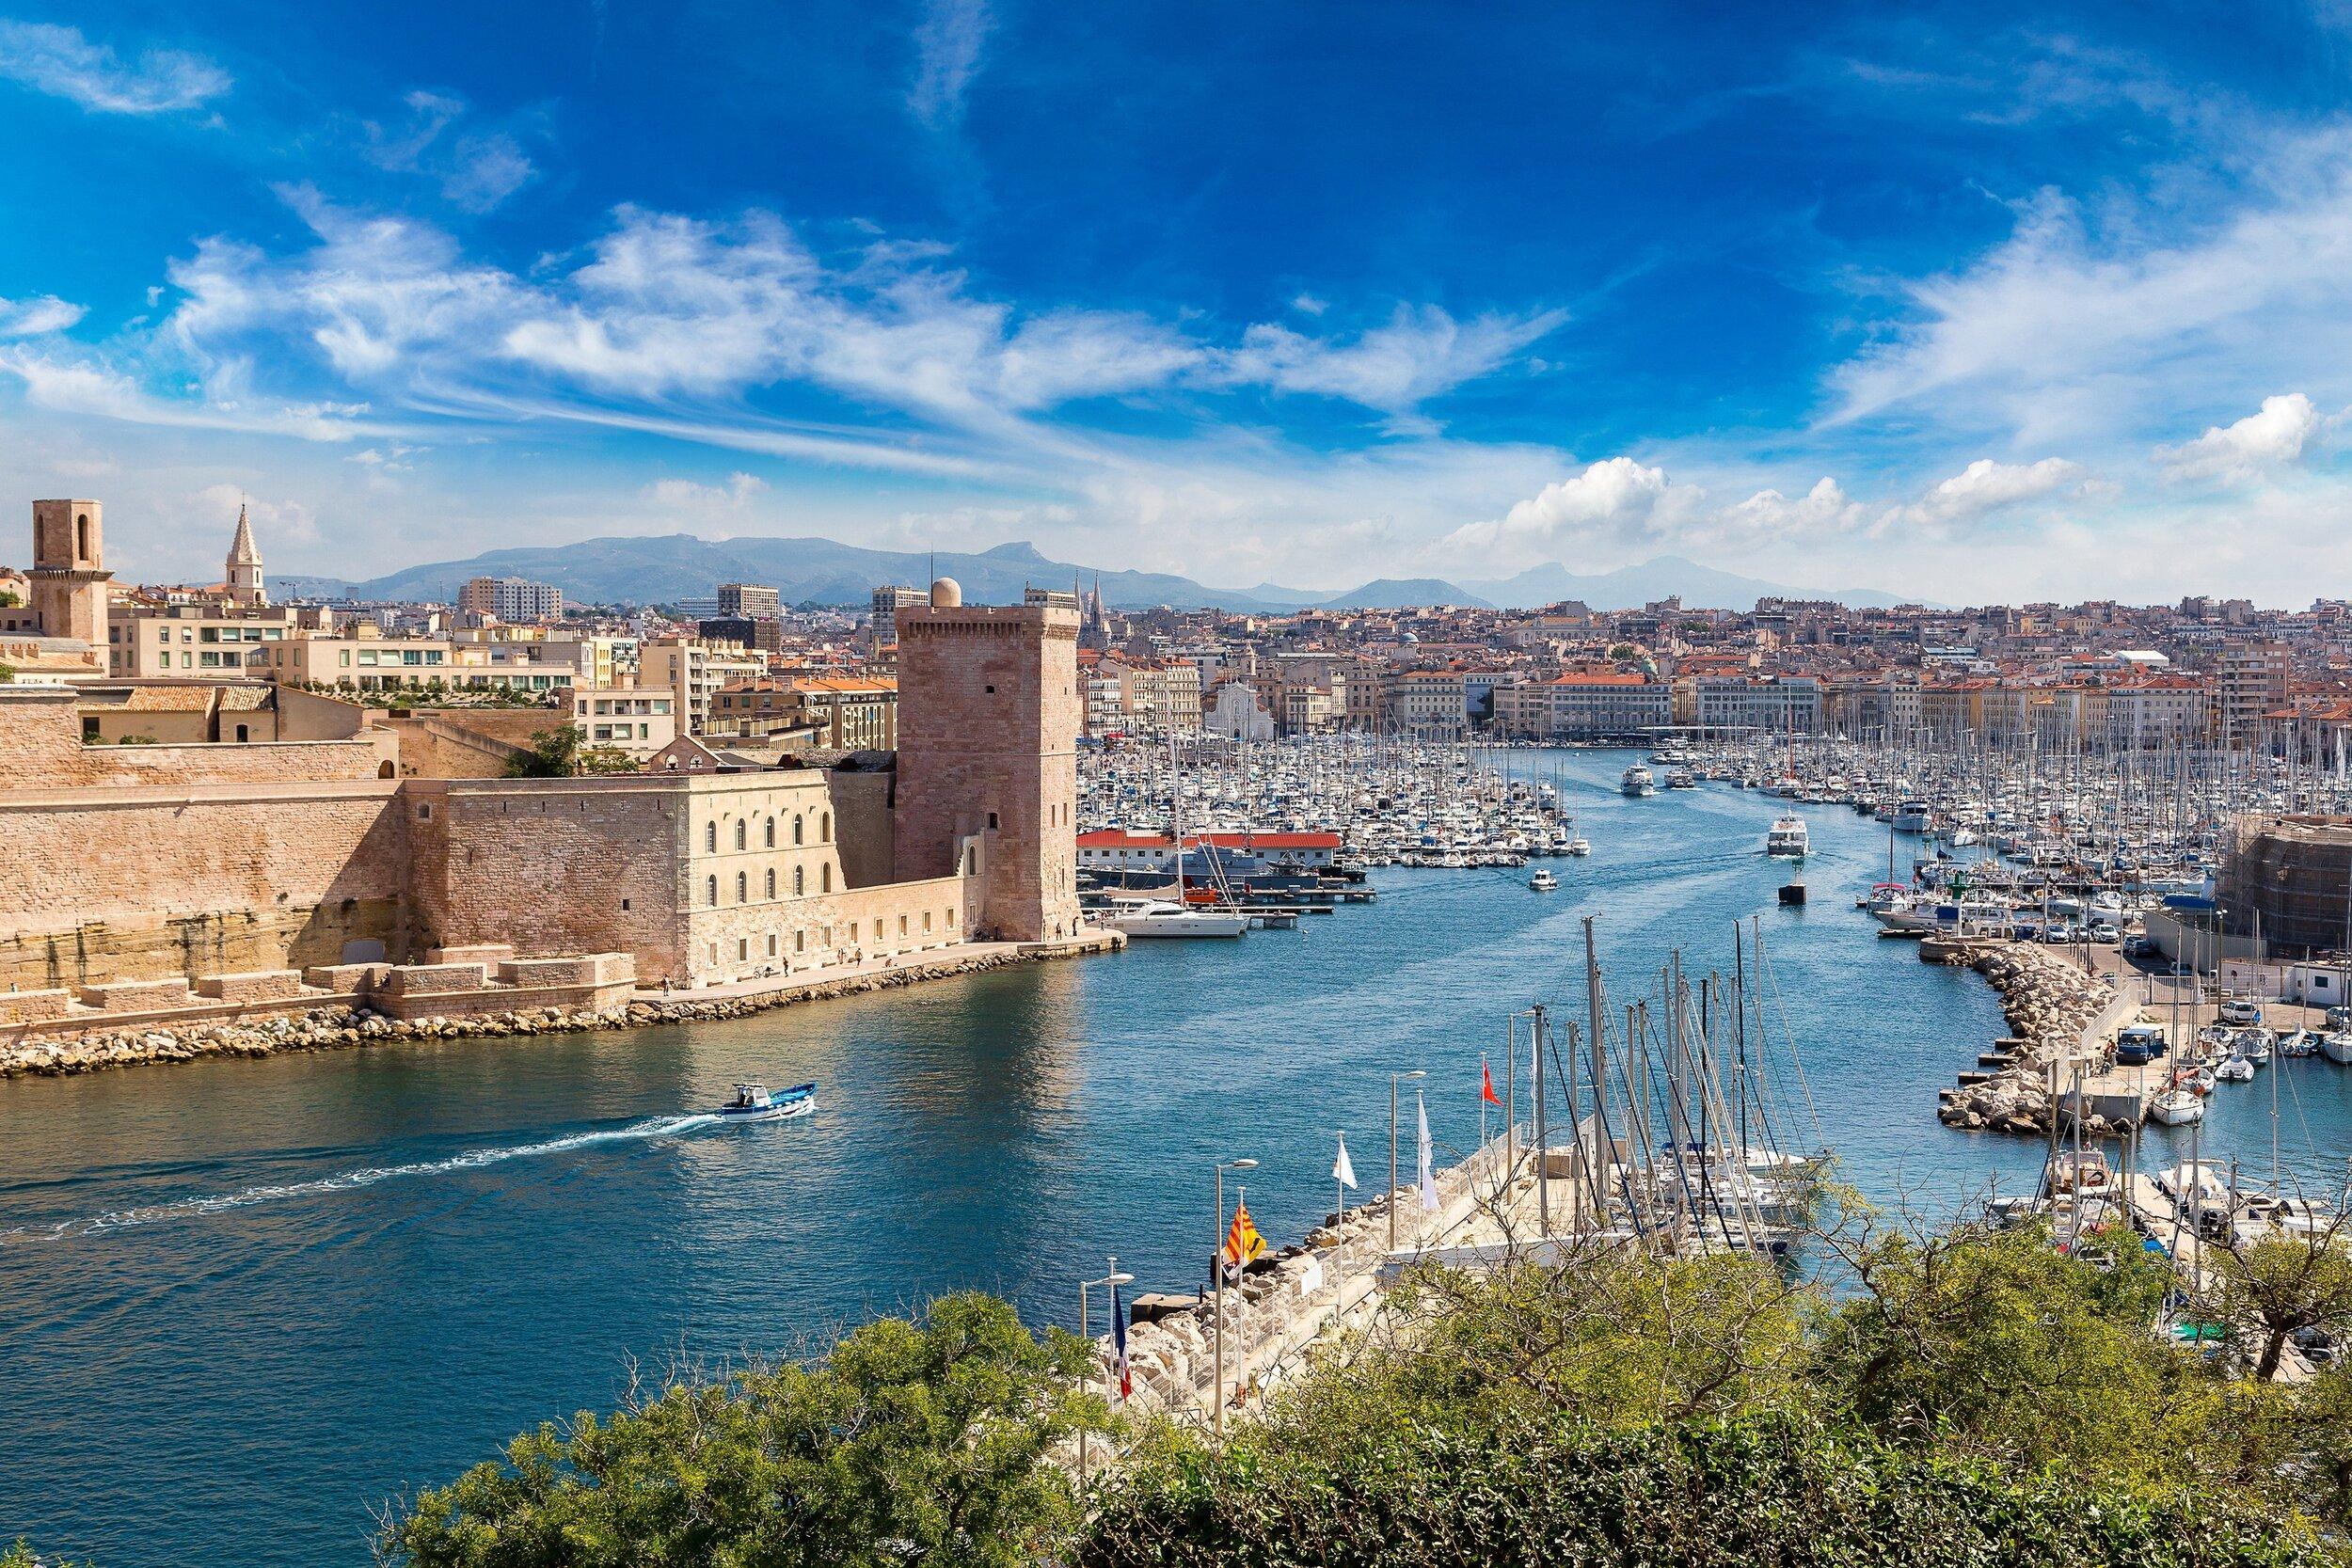 Marseille, the home of Bouillabaisse